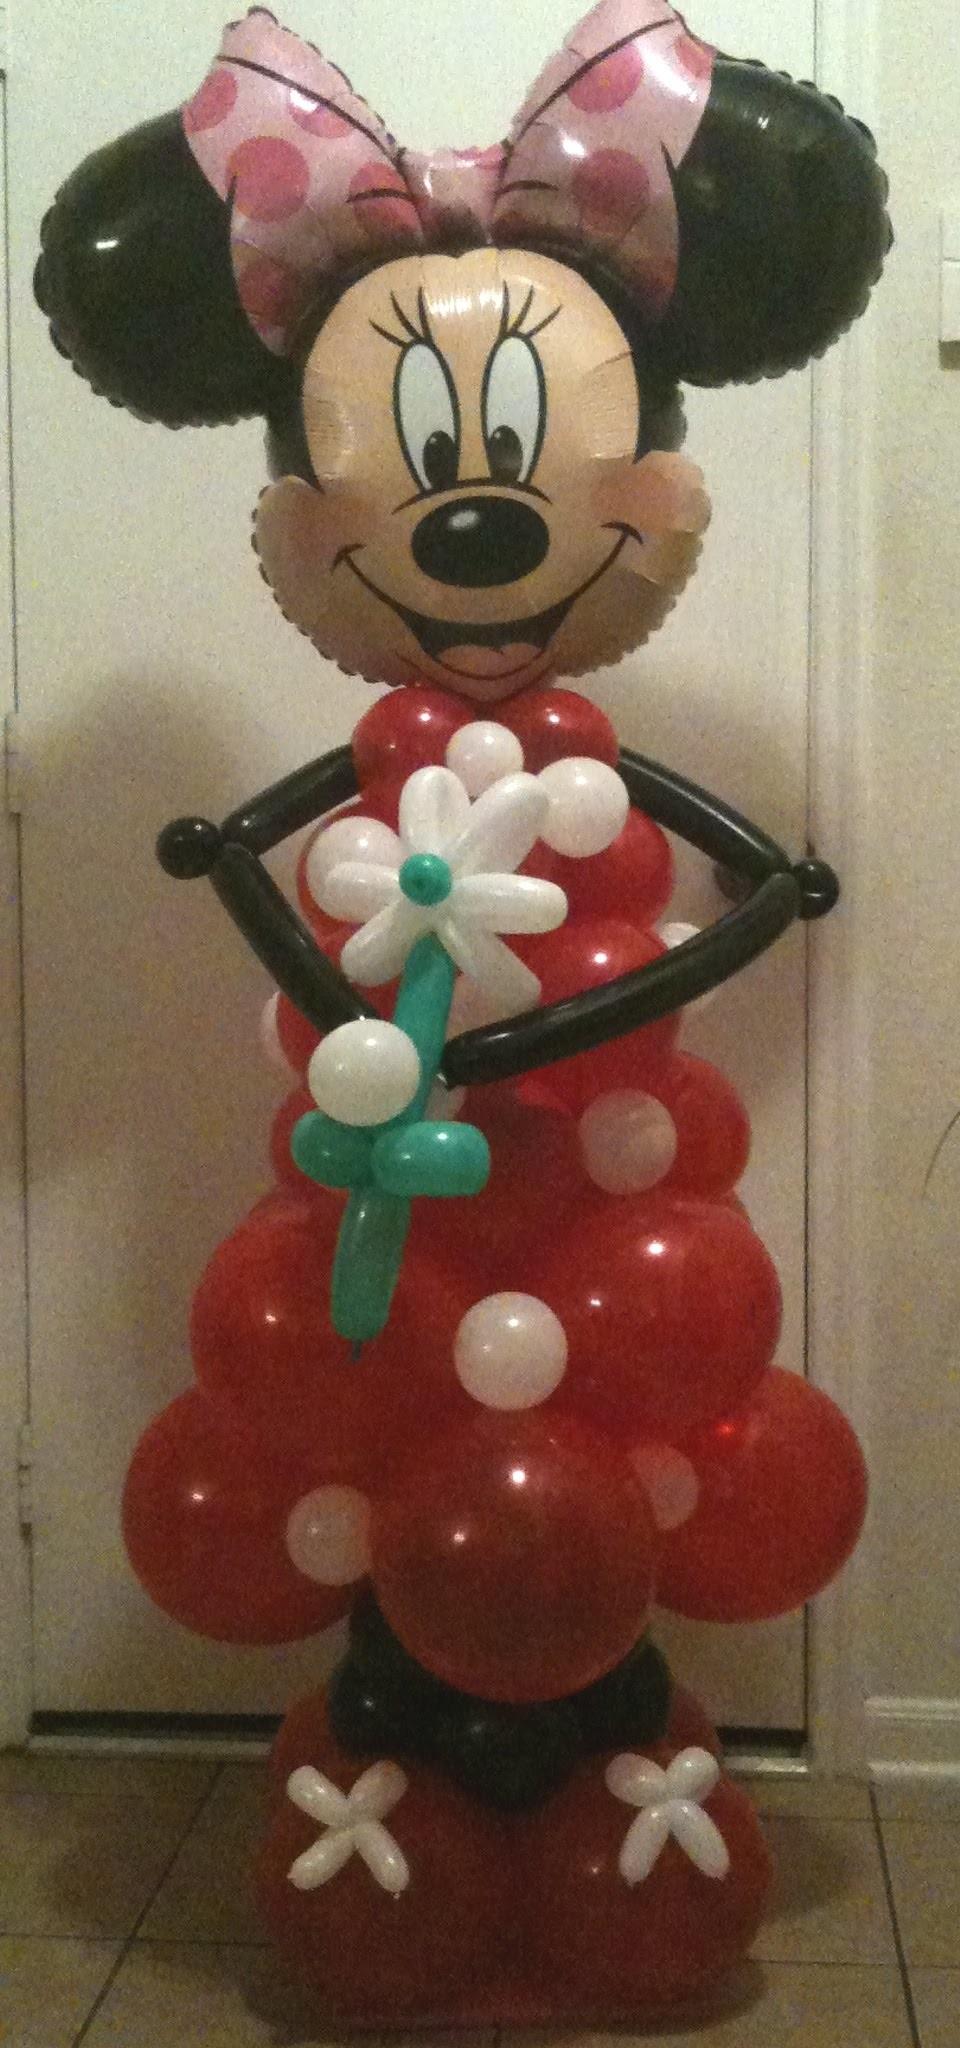 Mickey & Minnie Balloon Creations